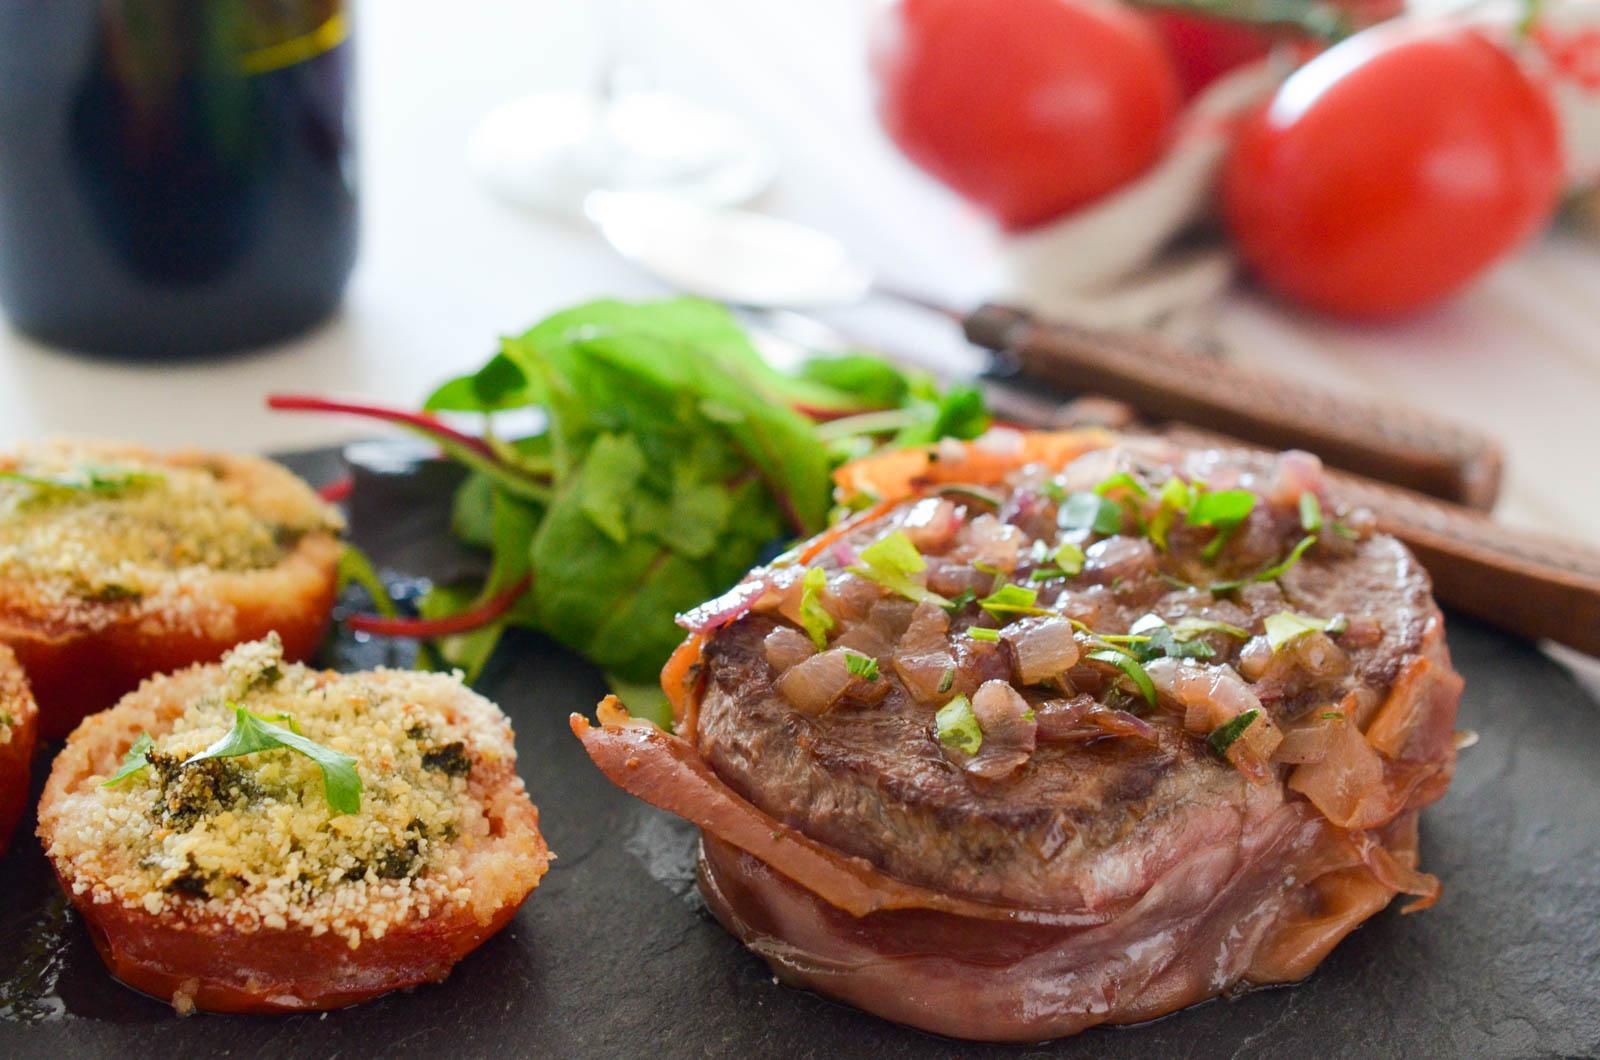 Steak Prosciutto Tomates Provencales (7 Sur 7)